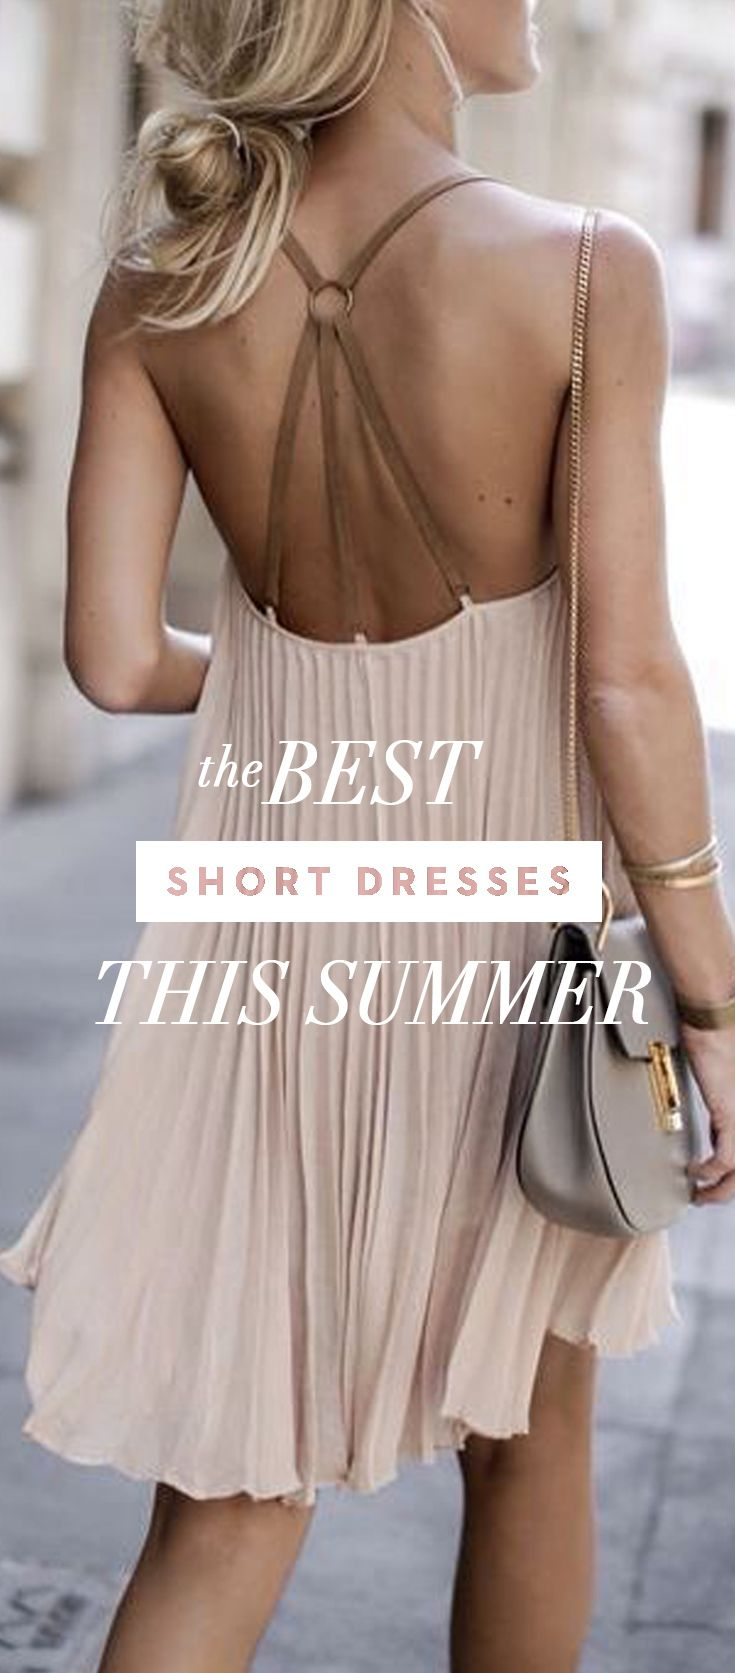 The best short dresses this summer dress pinterest shorts